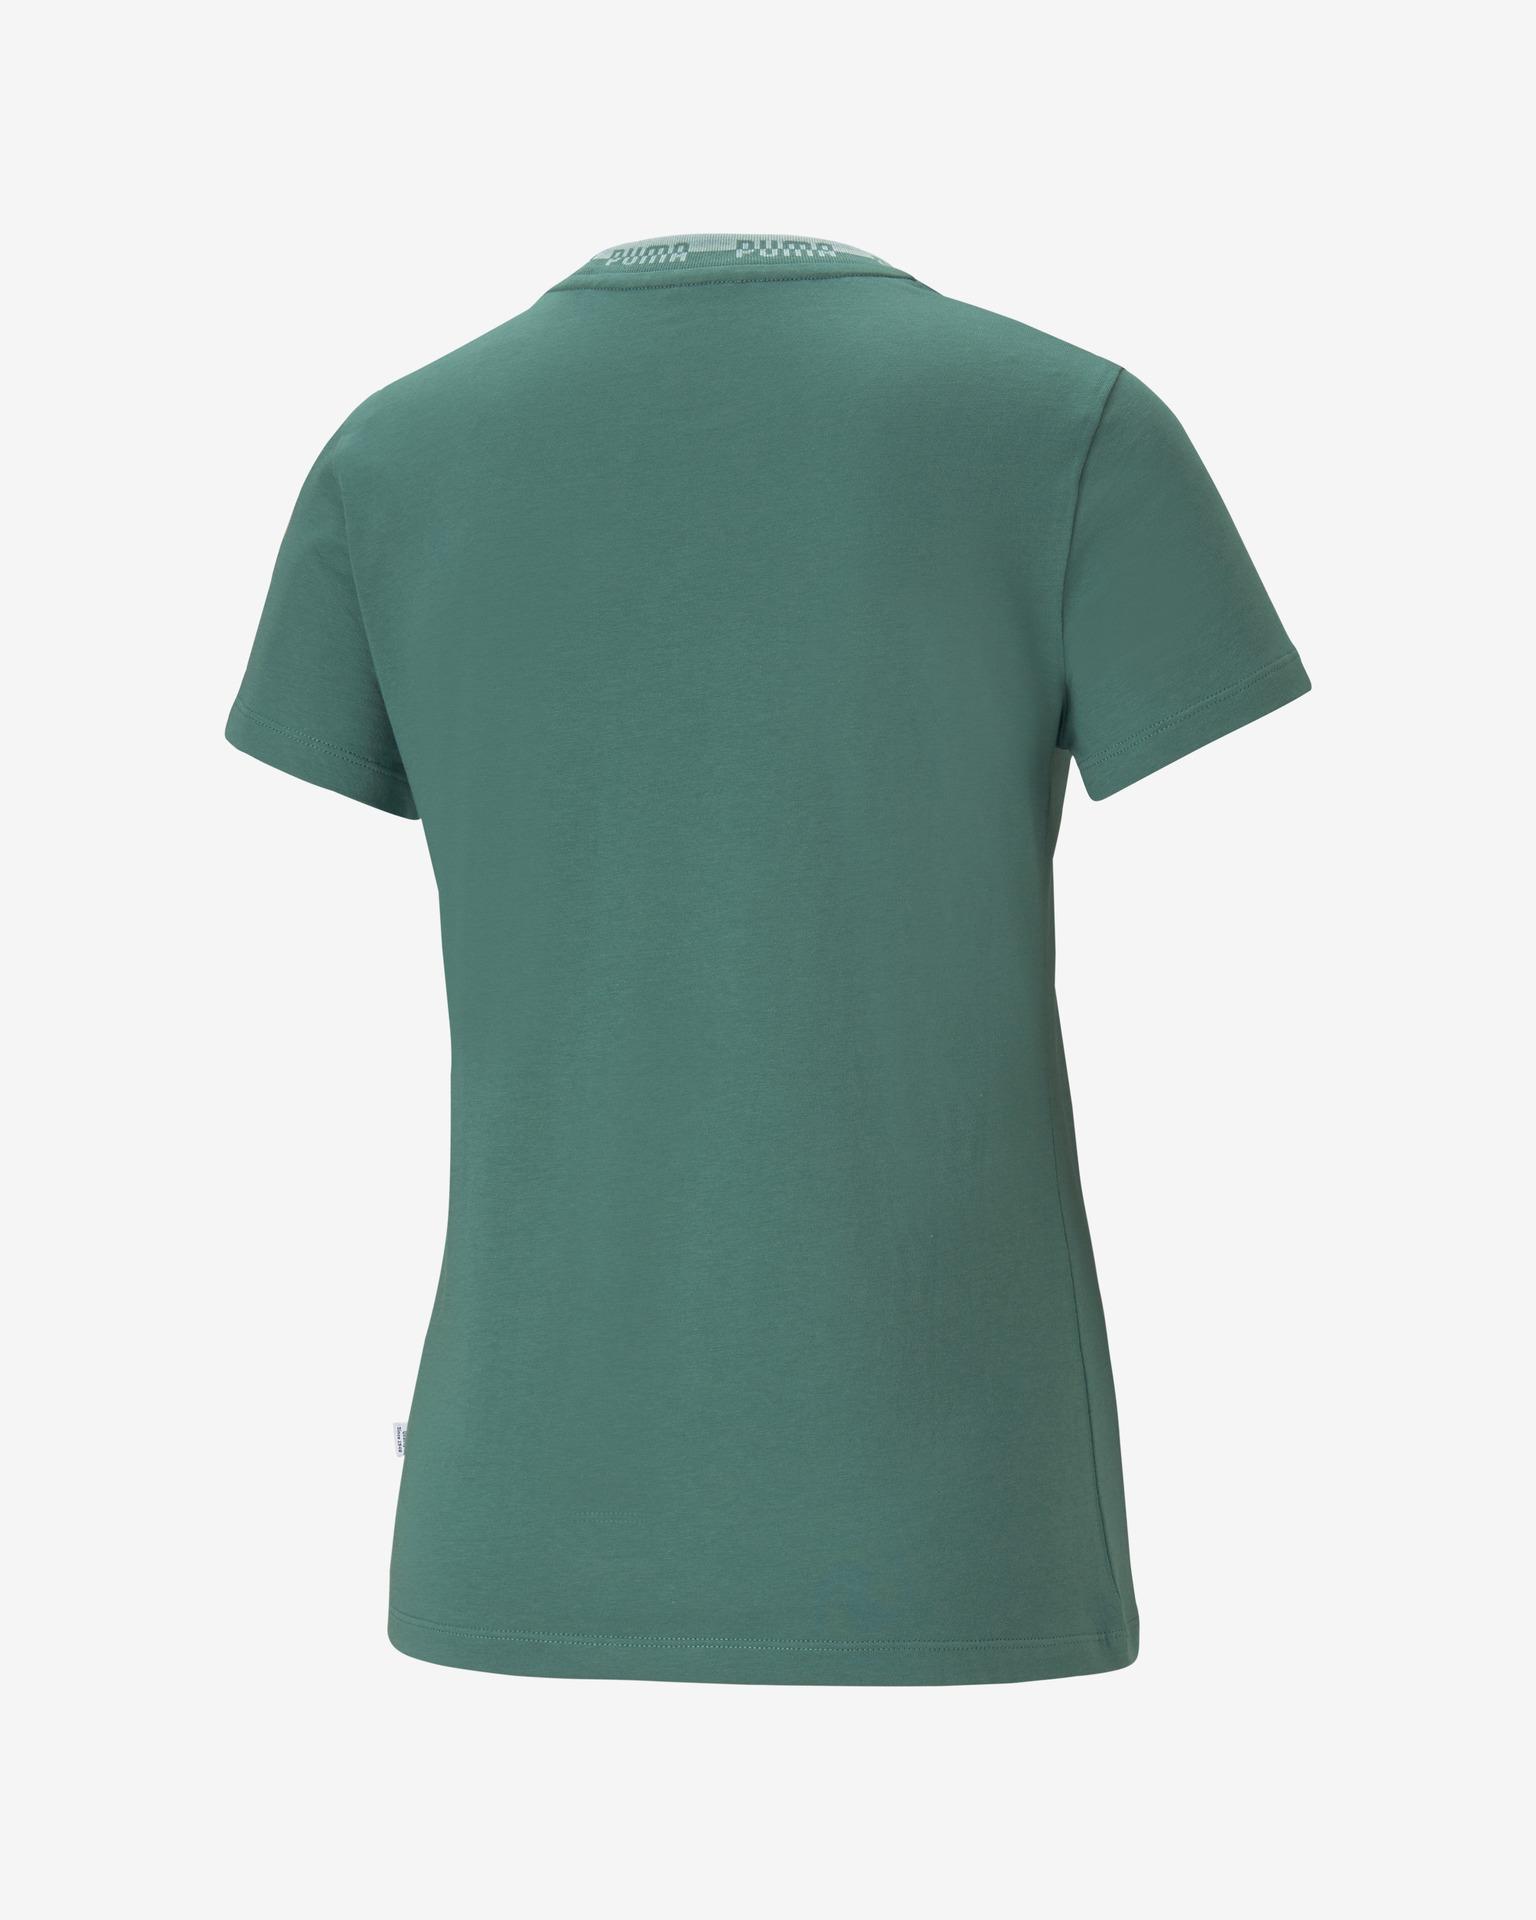 Puma Maglietta donna verde Triko